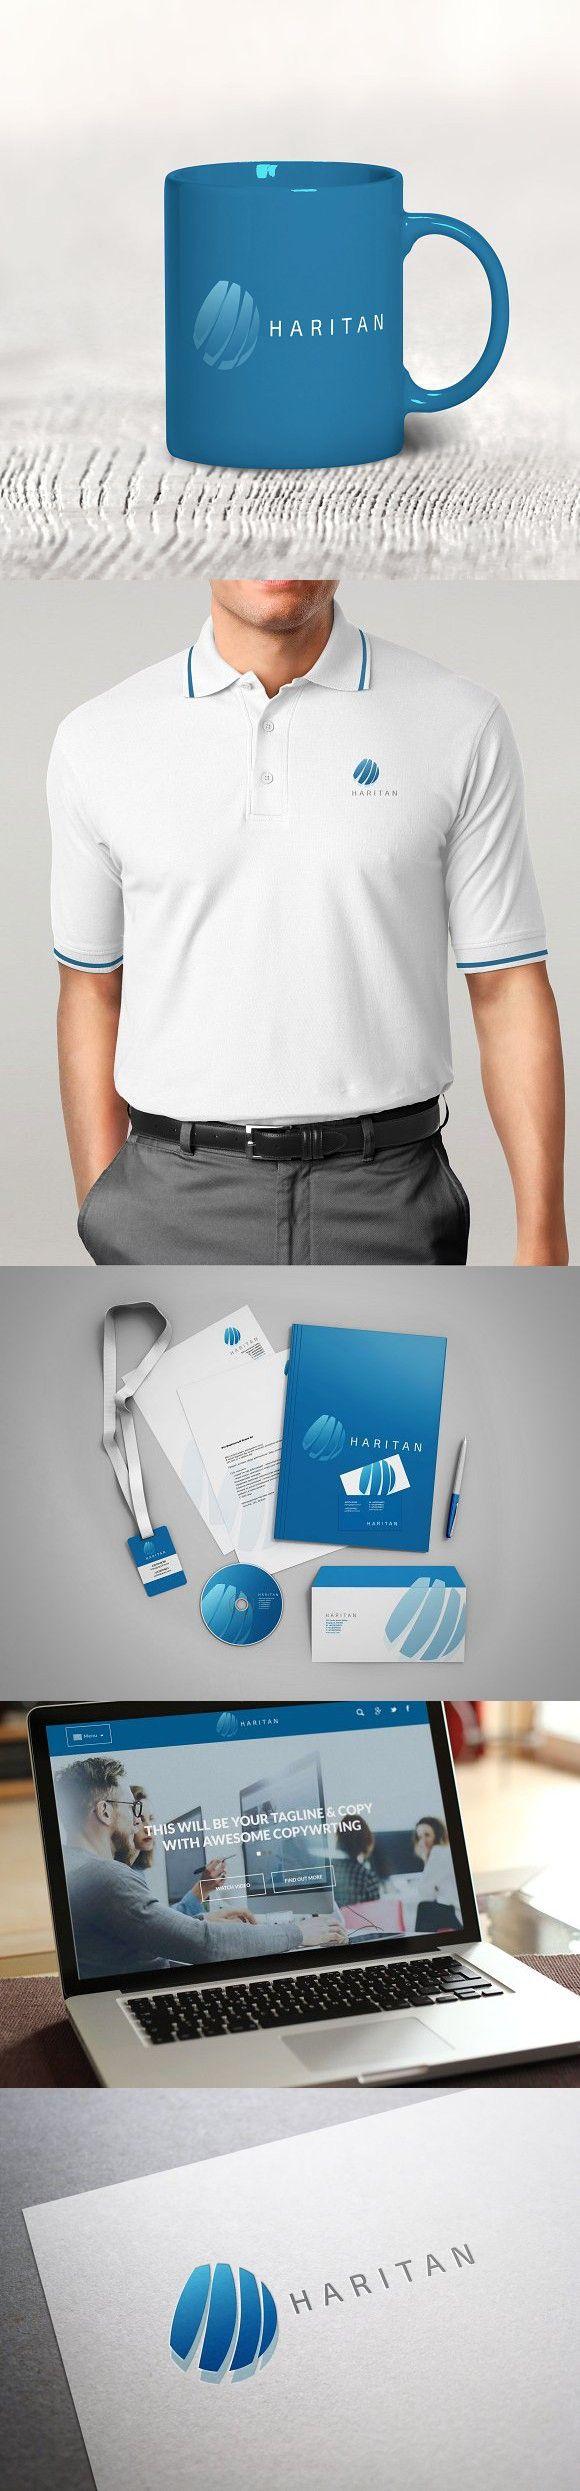 Haritan #business #stationary